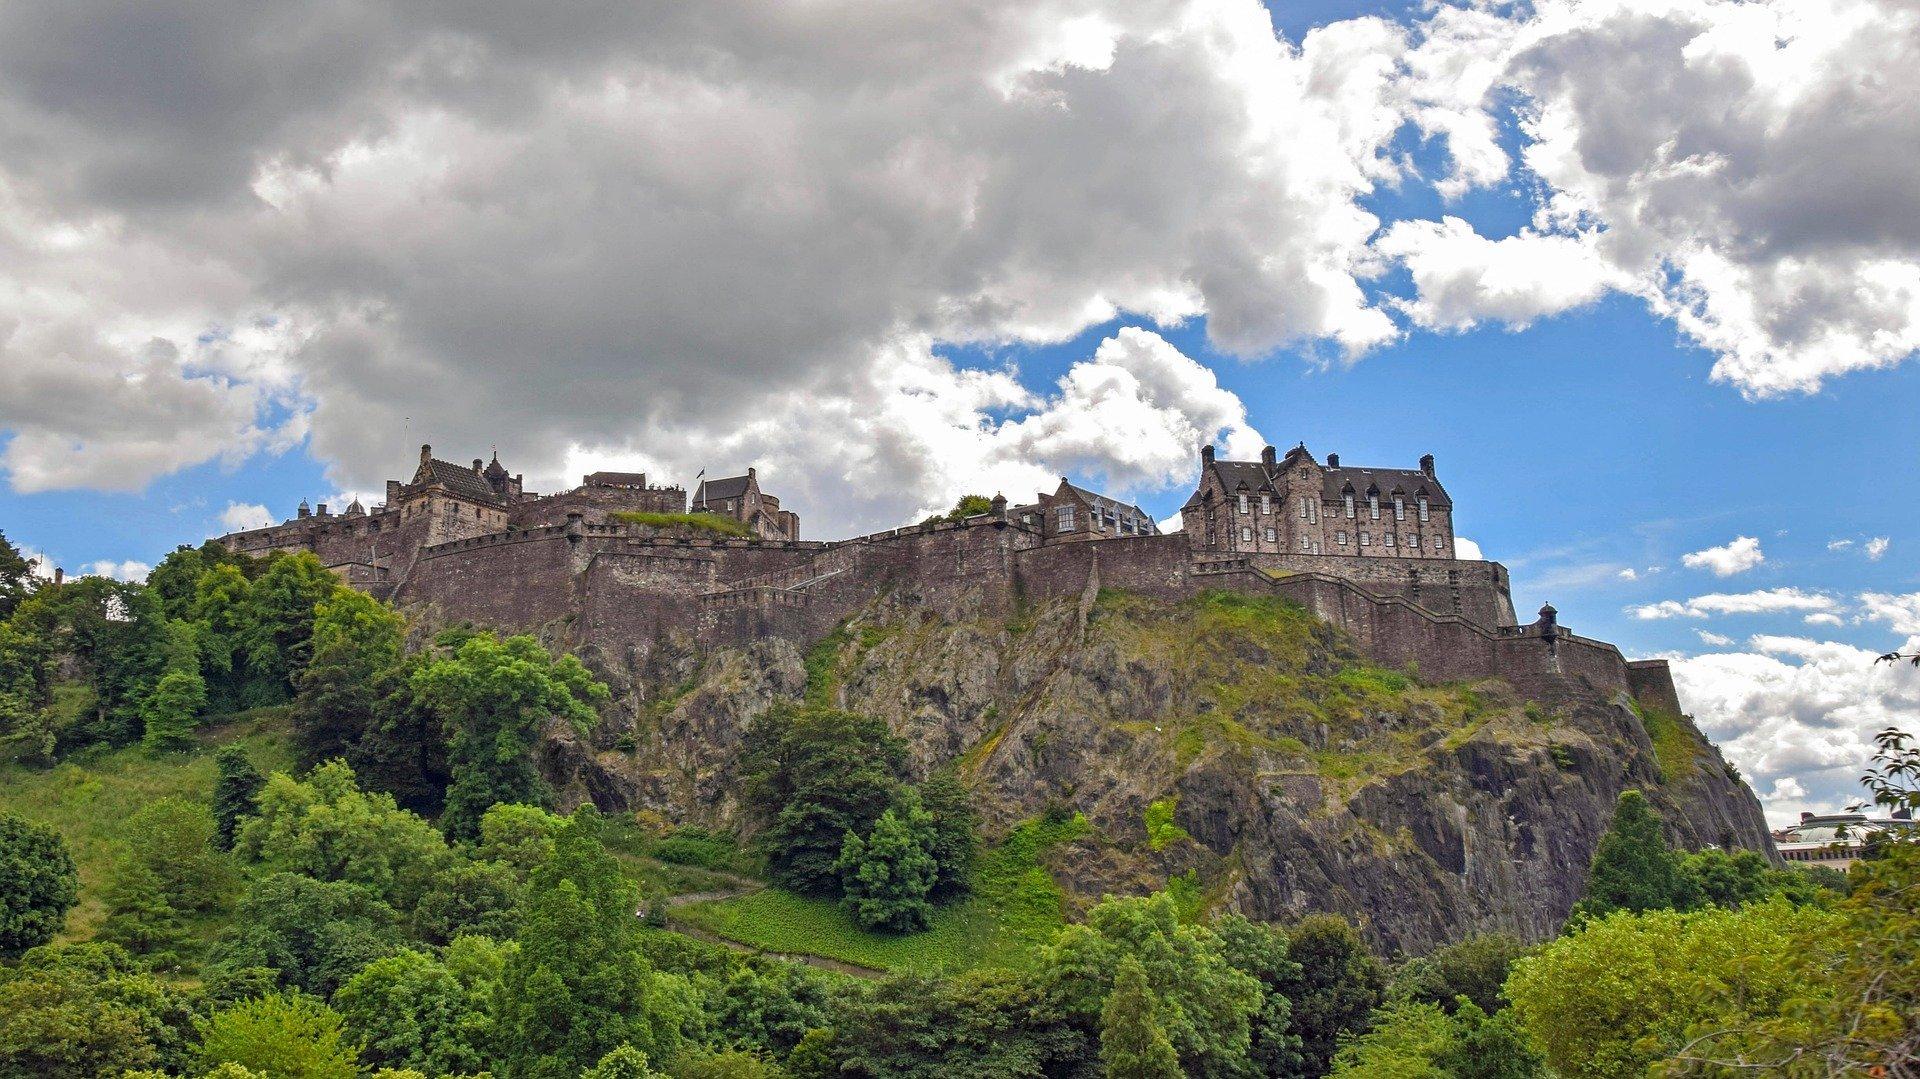 The history of Edinburgh